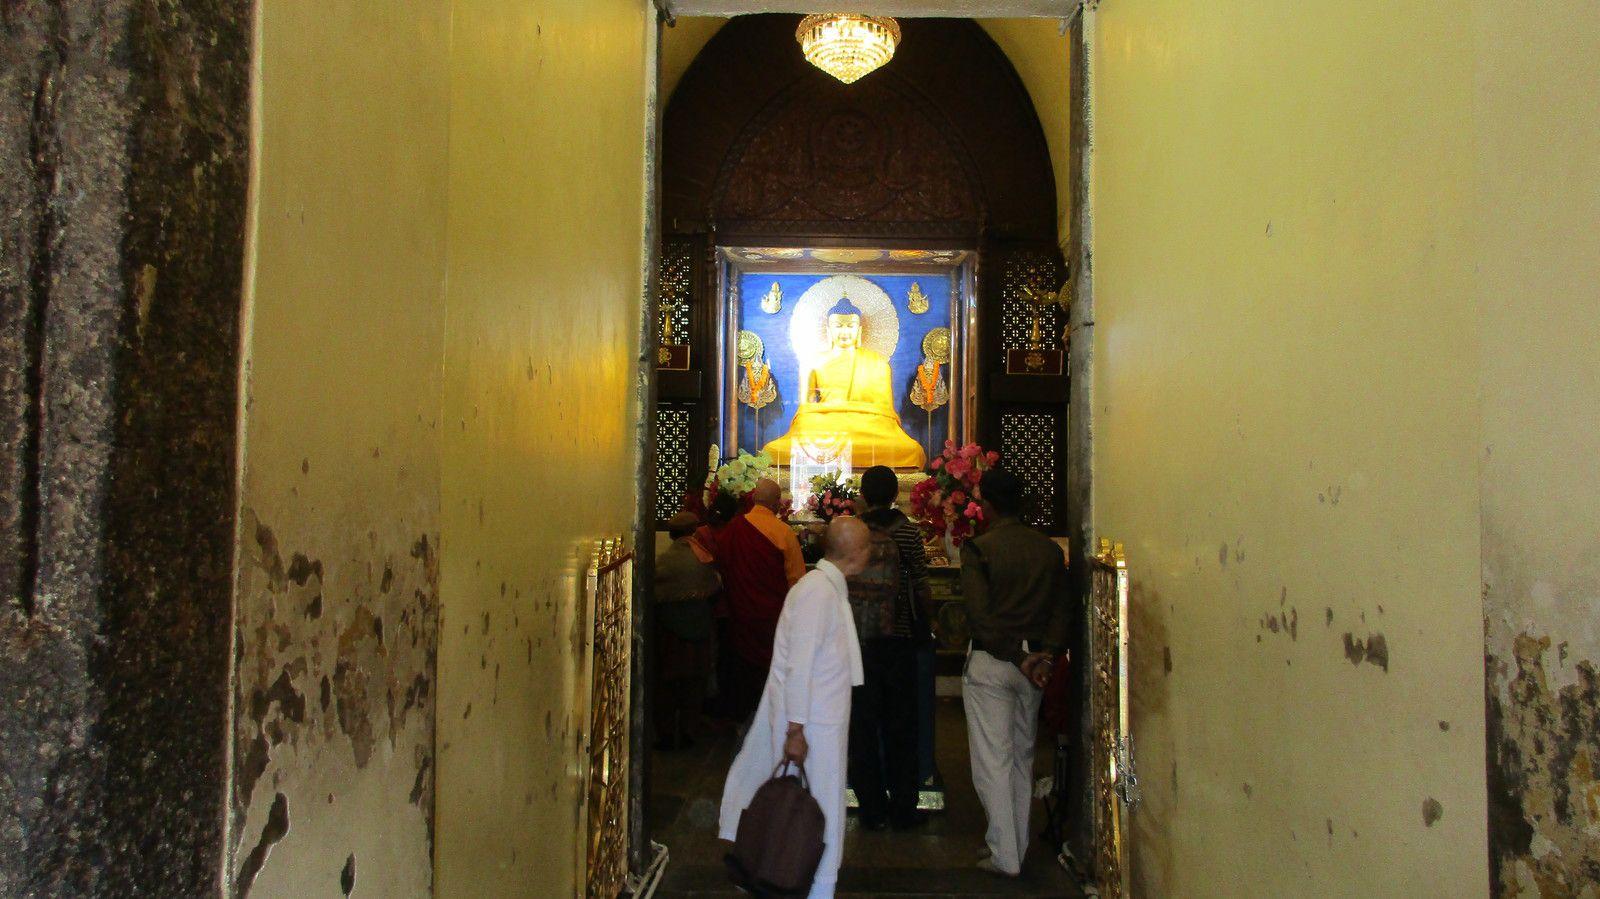 Voyage en Inde, au pays du bouddhisme 1/2